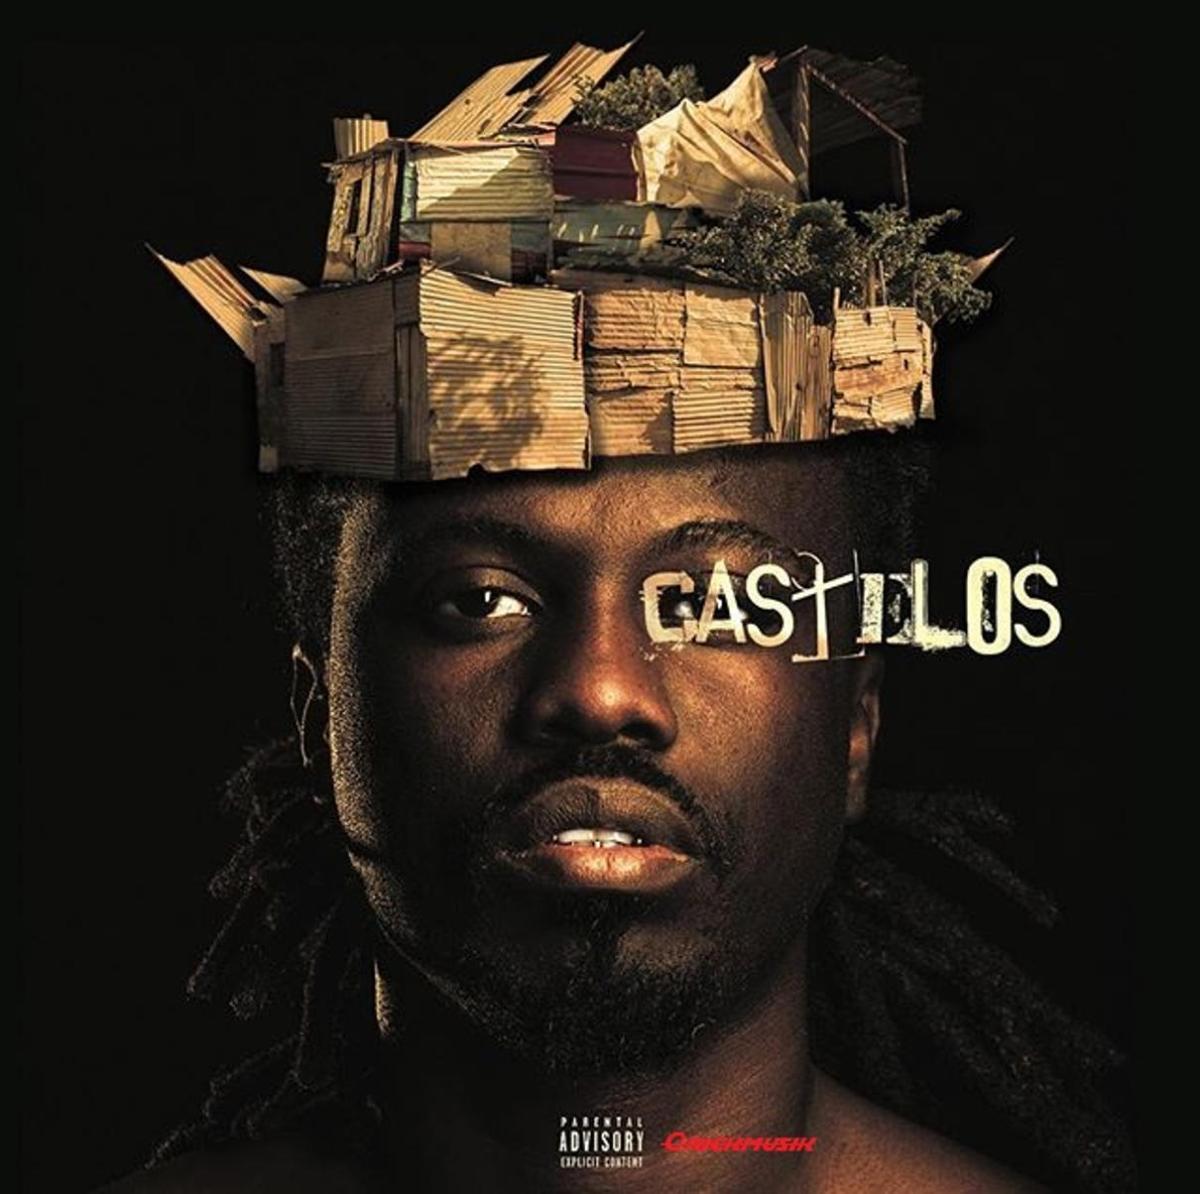 Prodigio - Castelos (Álbum Completo) 2019